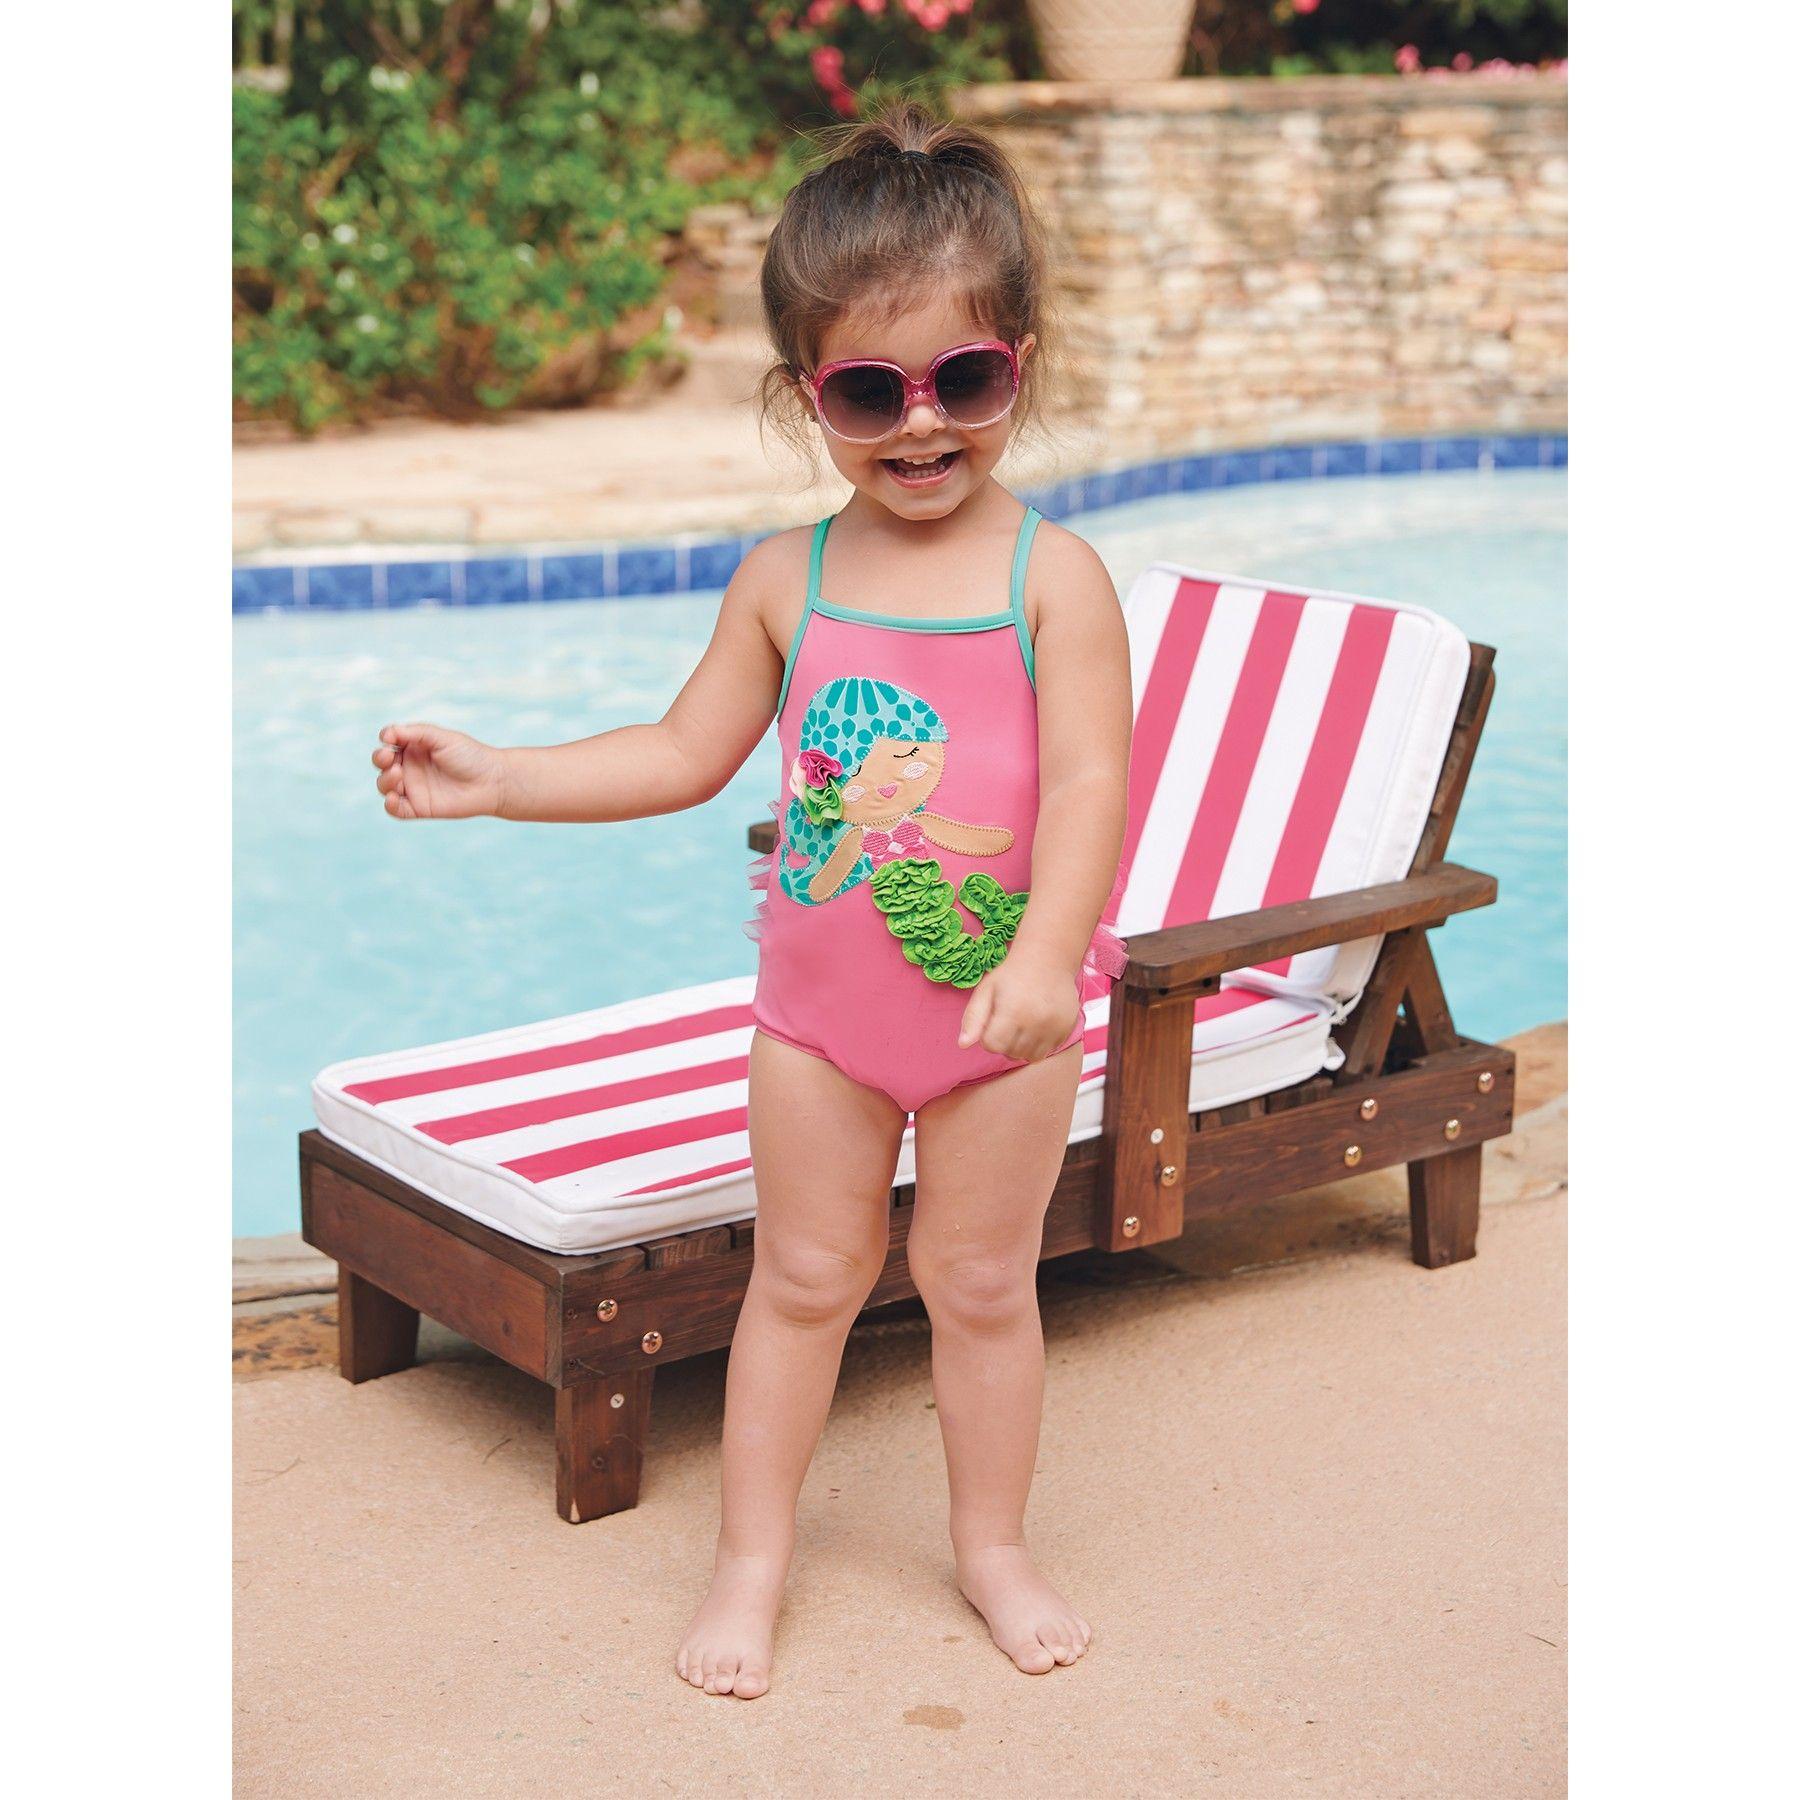 330a3ed84aa95 Mermaid Swimsuit by Mud Pie | Bella | Mermaid swimsuit, Little ...